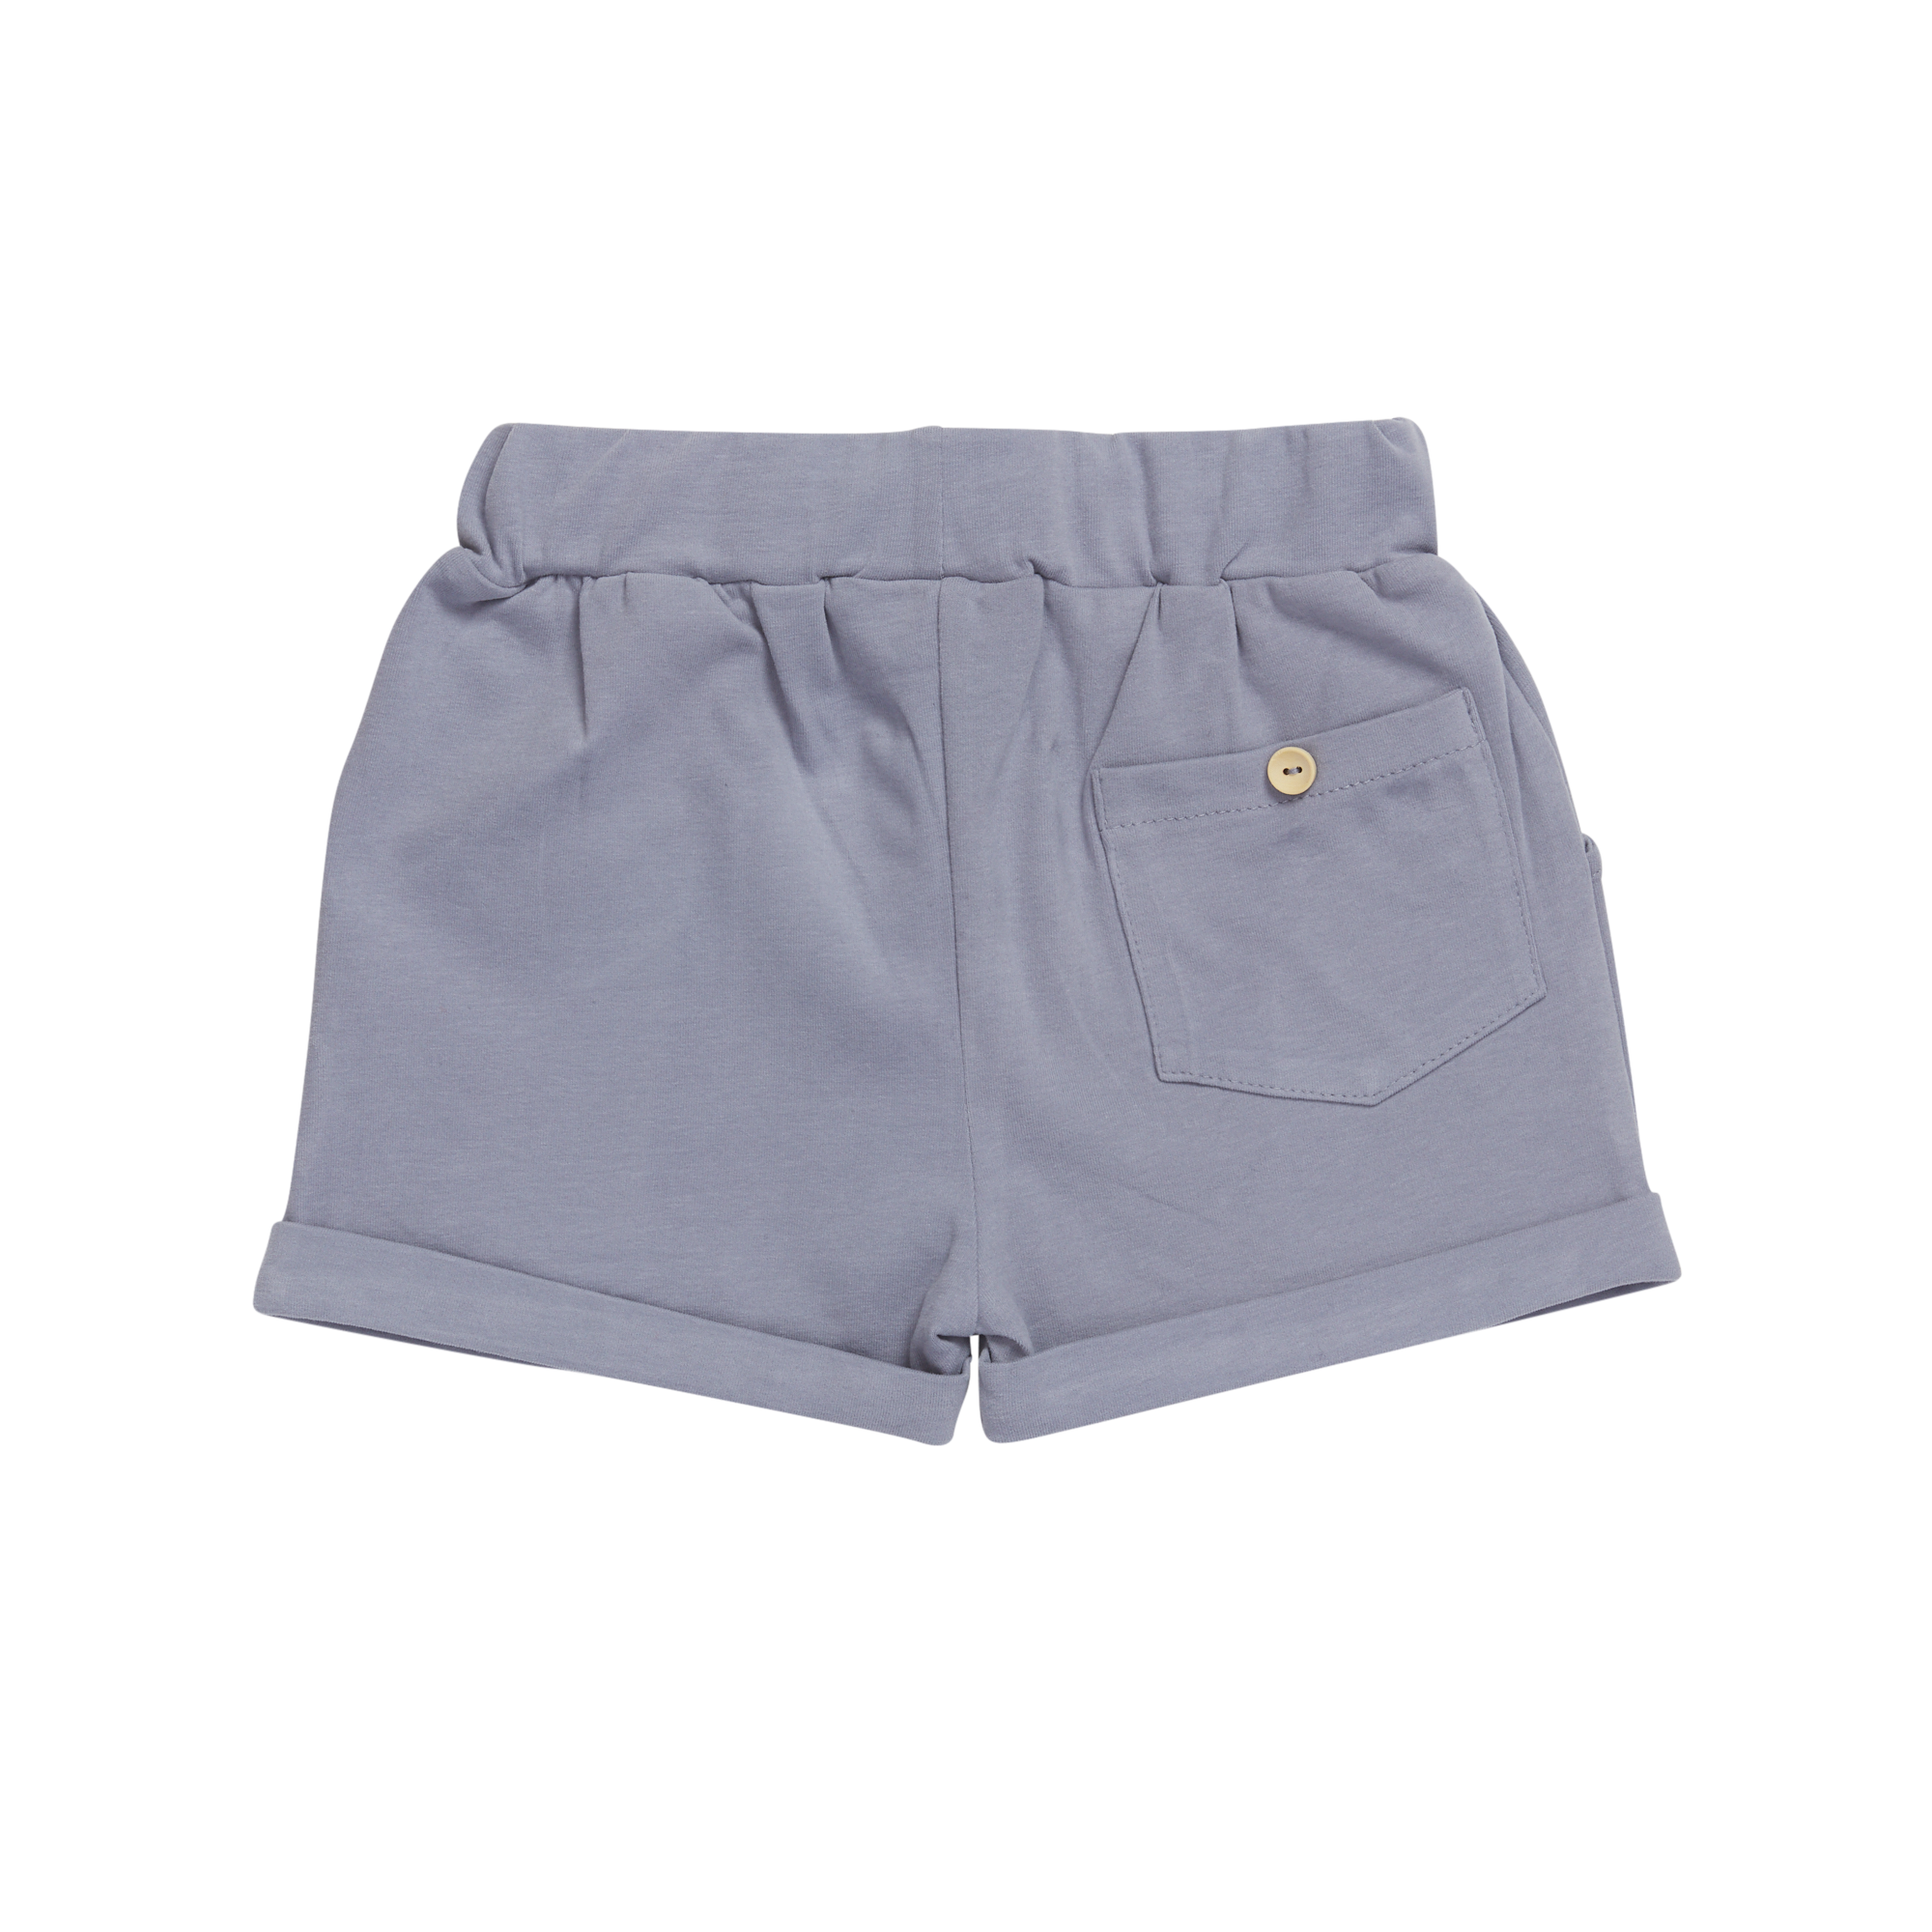 Shorts - Blue Grey-3